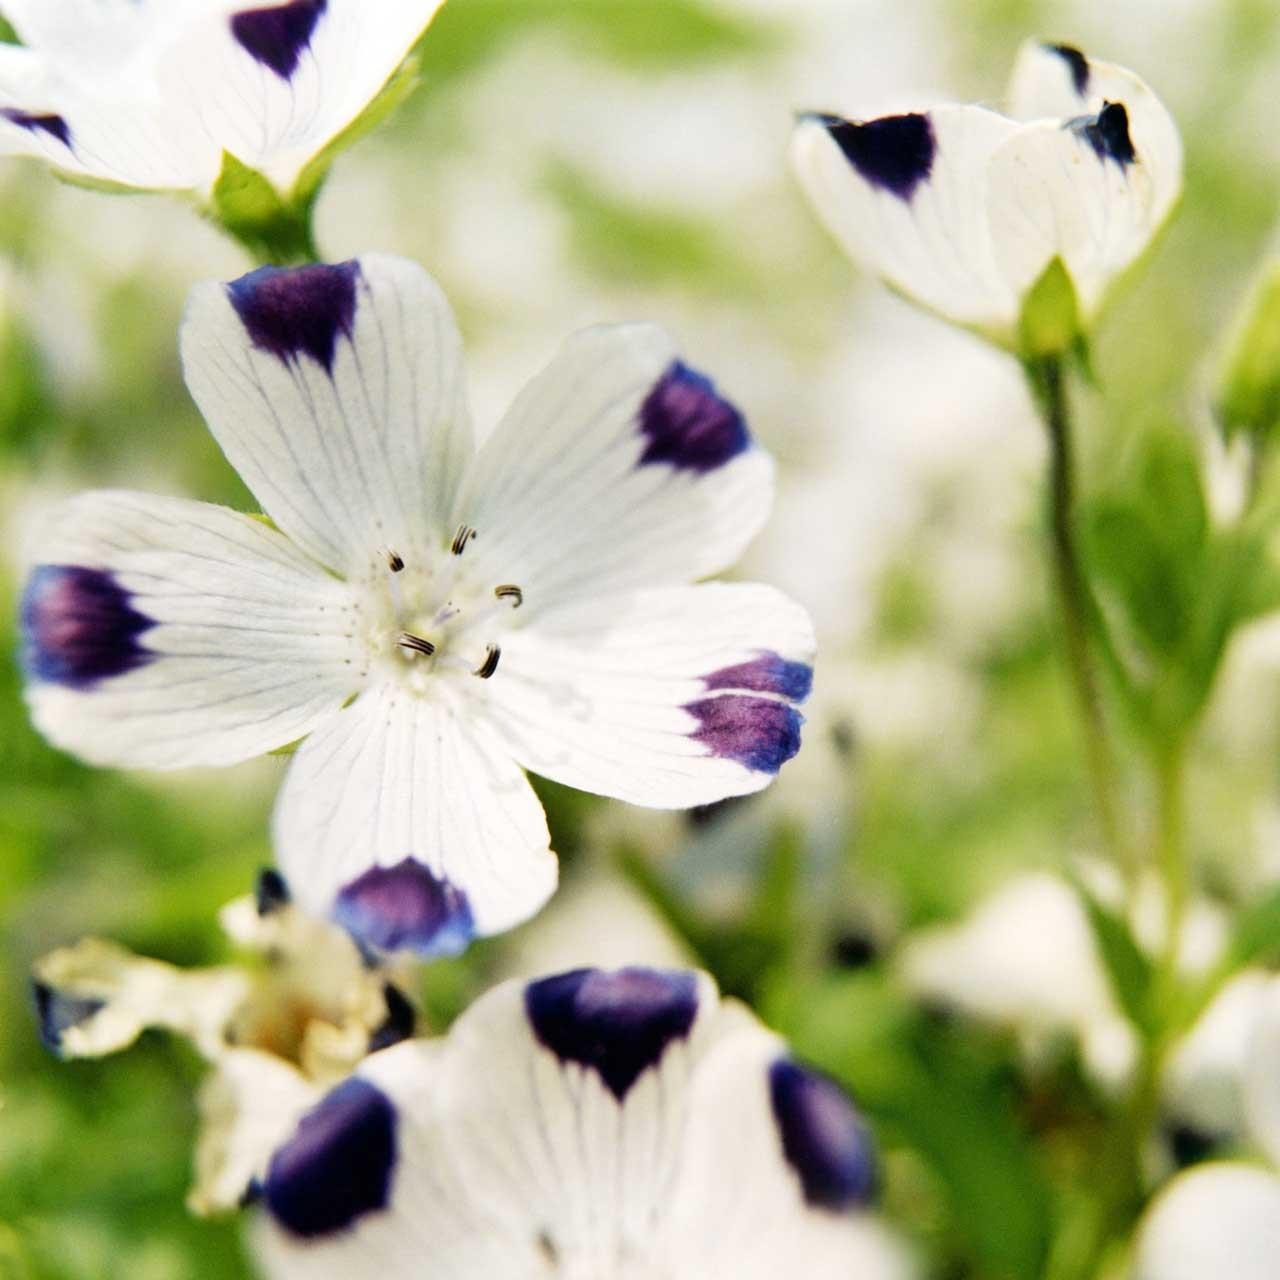 Laure-Maud_14_photographe_jardin-fleurs_02